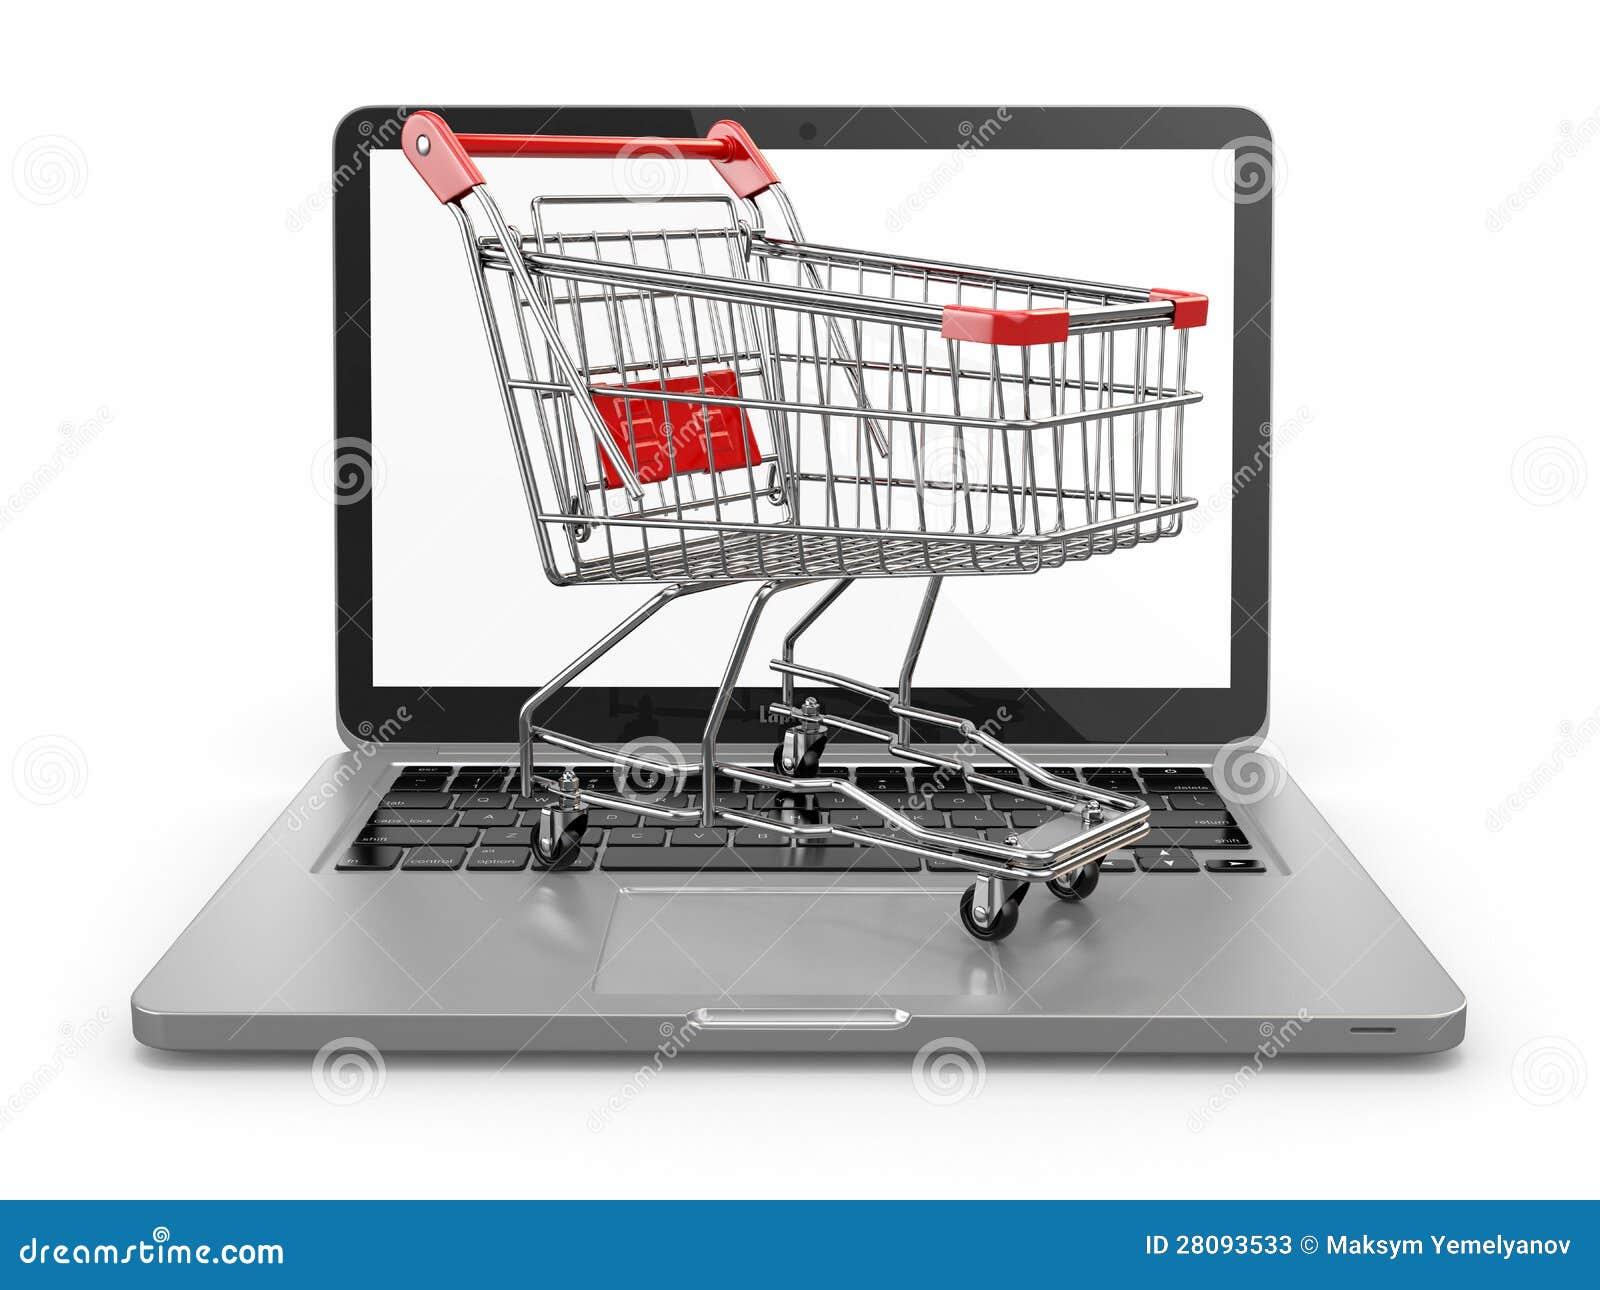 Shopping Cart Ecommerce Software 1shoppingcartcom | Ask Home Design